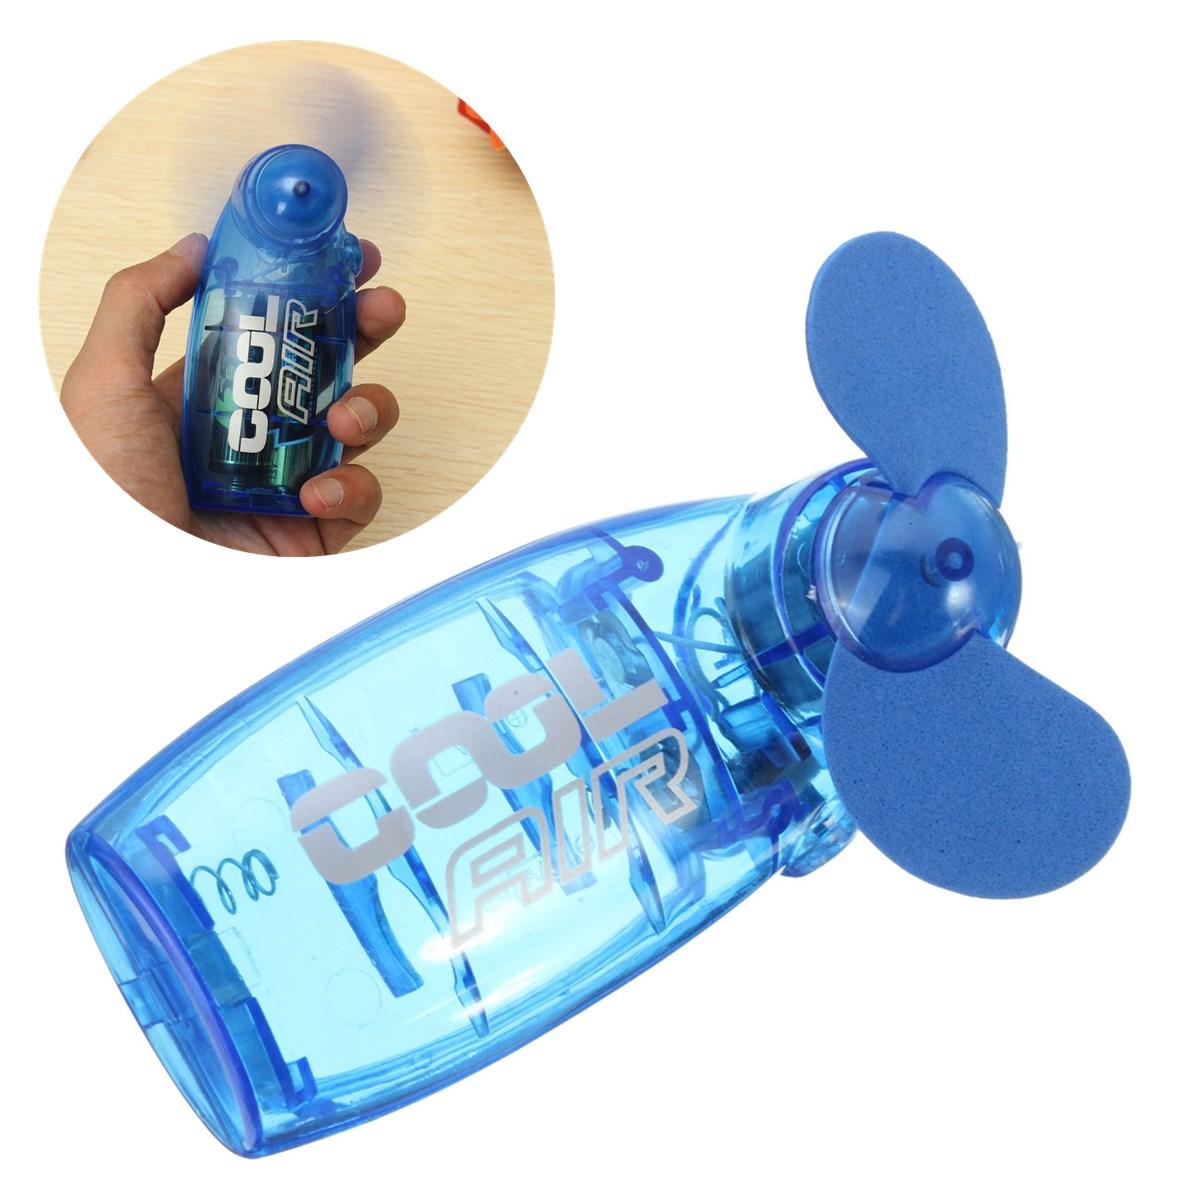 Portable Hand Fan : Mini portable pocket fan cool air hand held battery travel